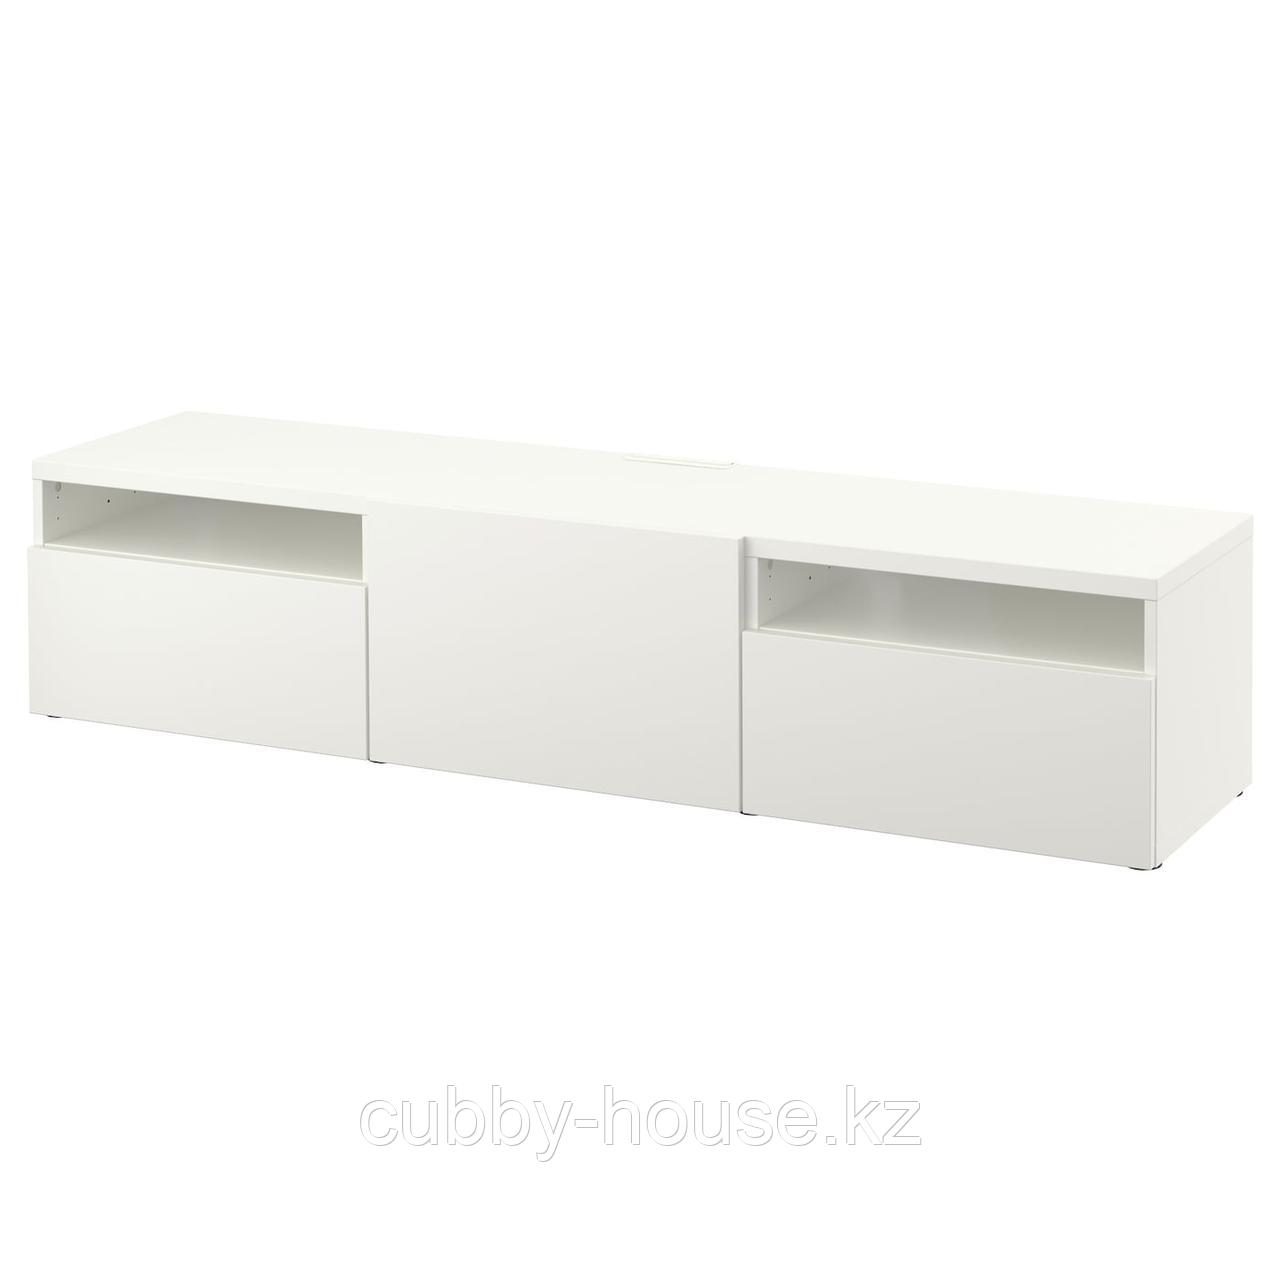 БЕСТО Тумба под ТВ, белый, Лаппвикен белый, 180x42x39 см